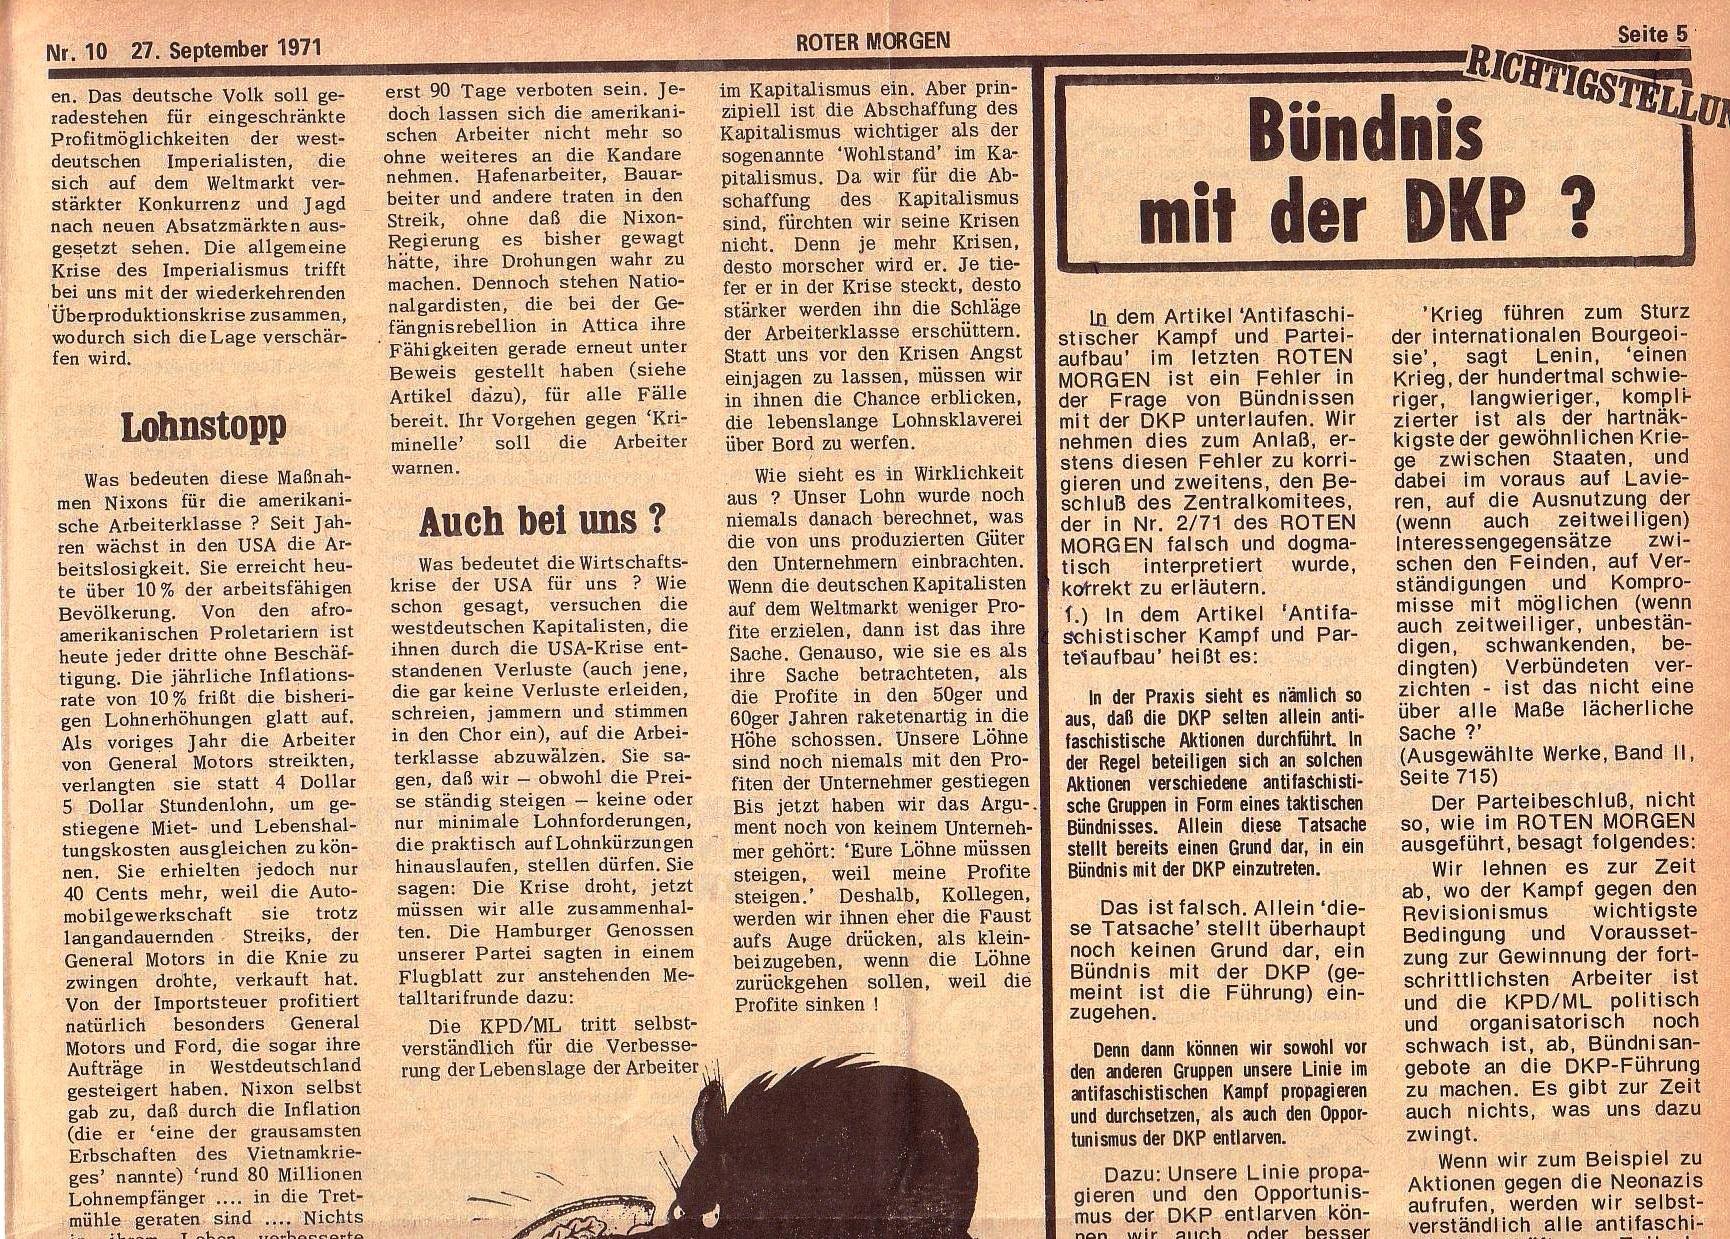 Roter Morgen, 5. Jg., 27. September 1971, Nr. 10, Seite 5a